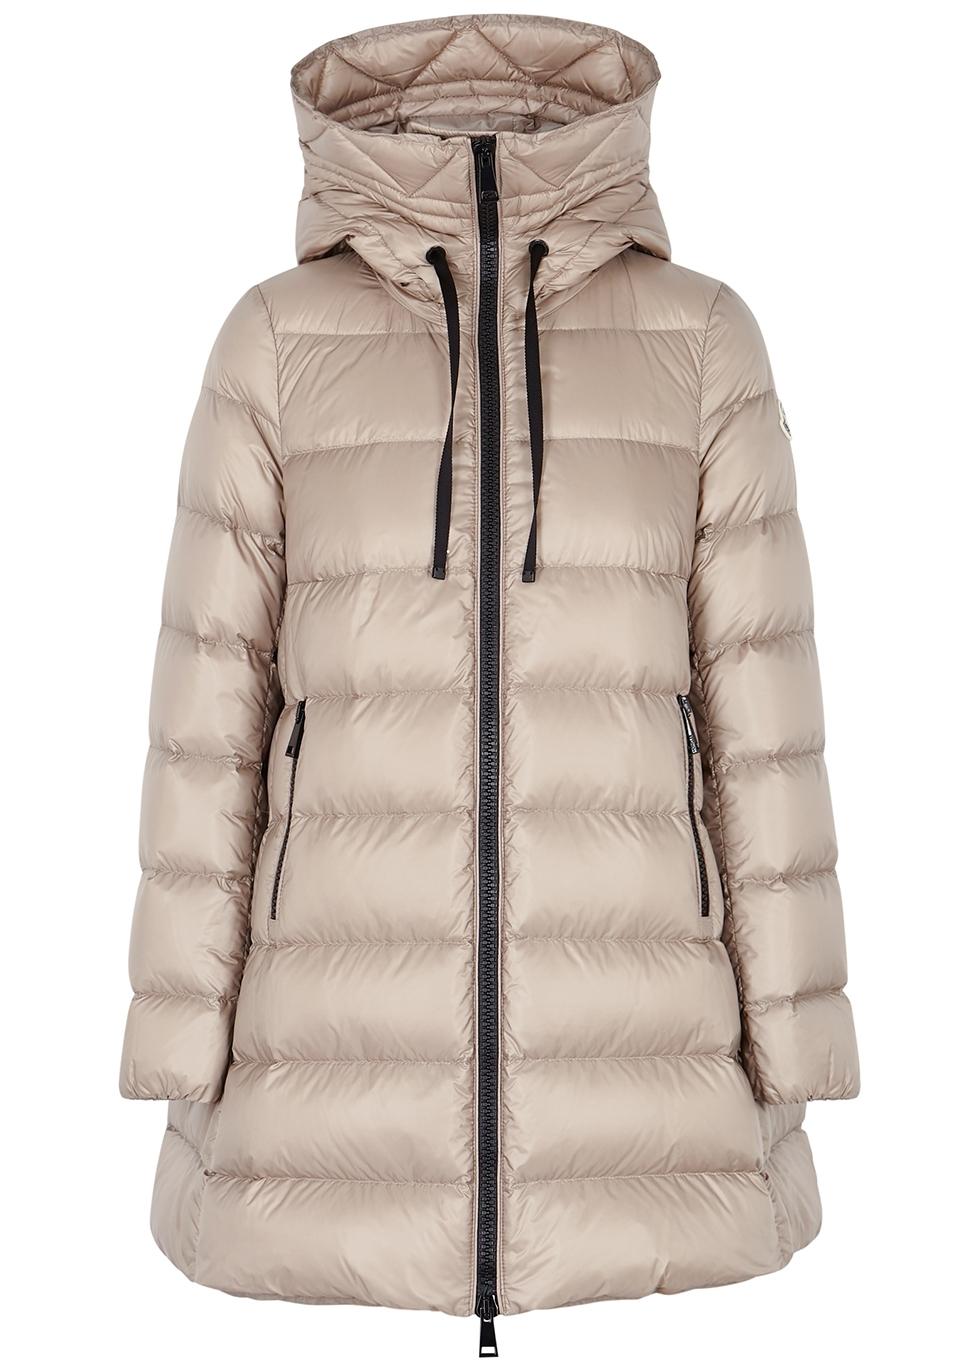 7d74578384db Moncler - Designer Jackets, Coats, Gilets - Harvey Nichols